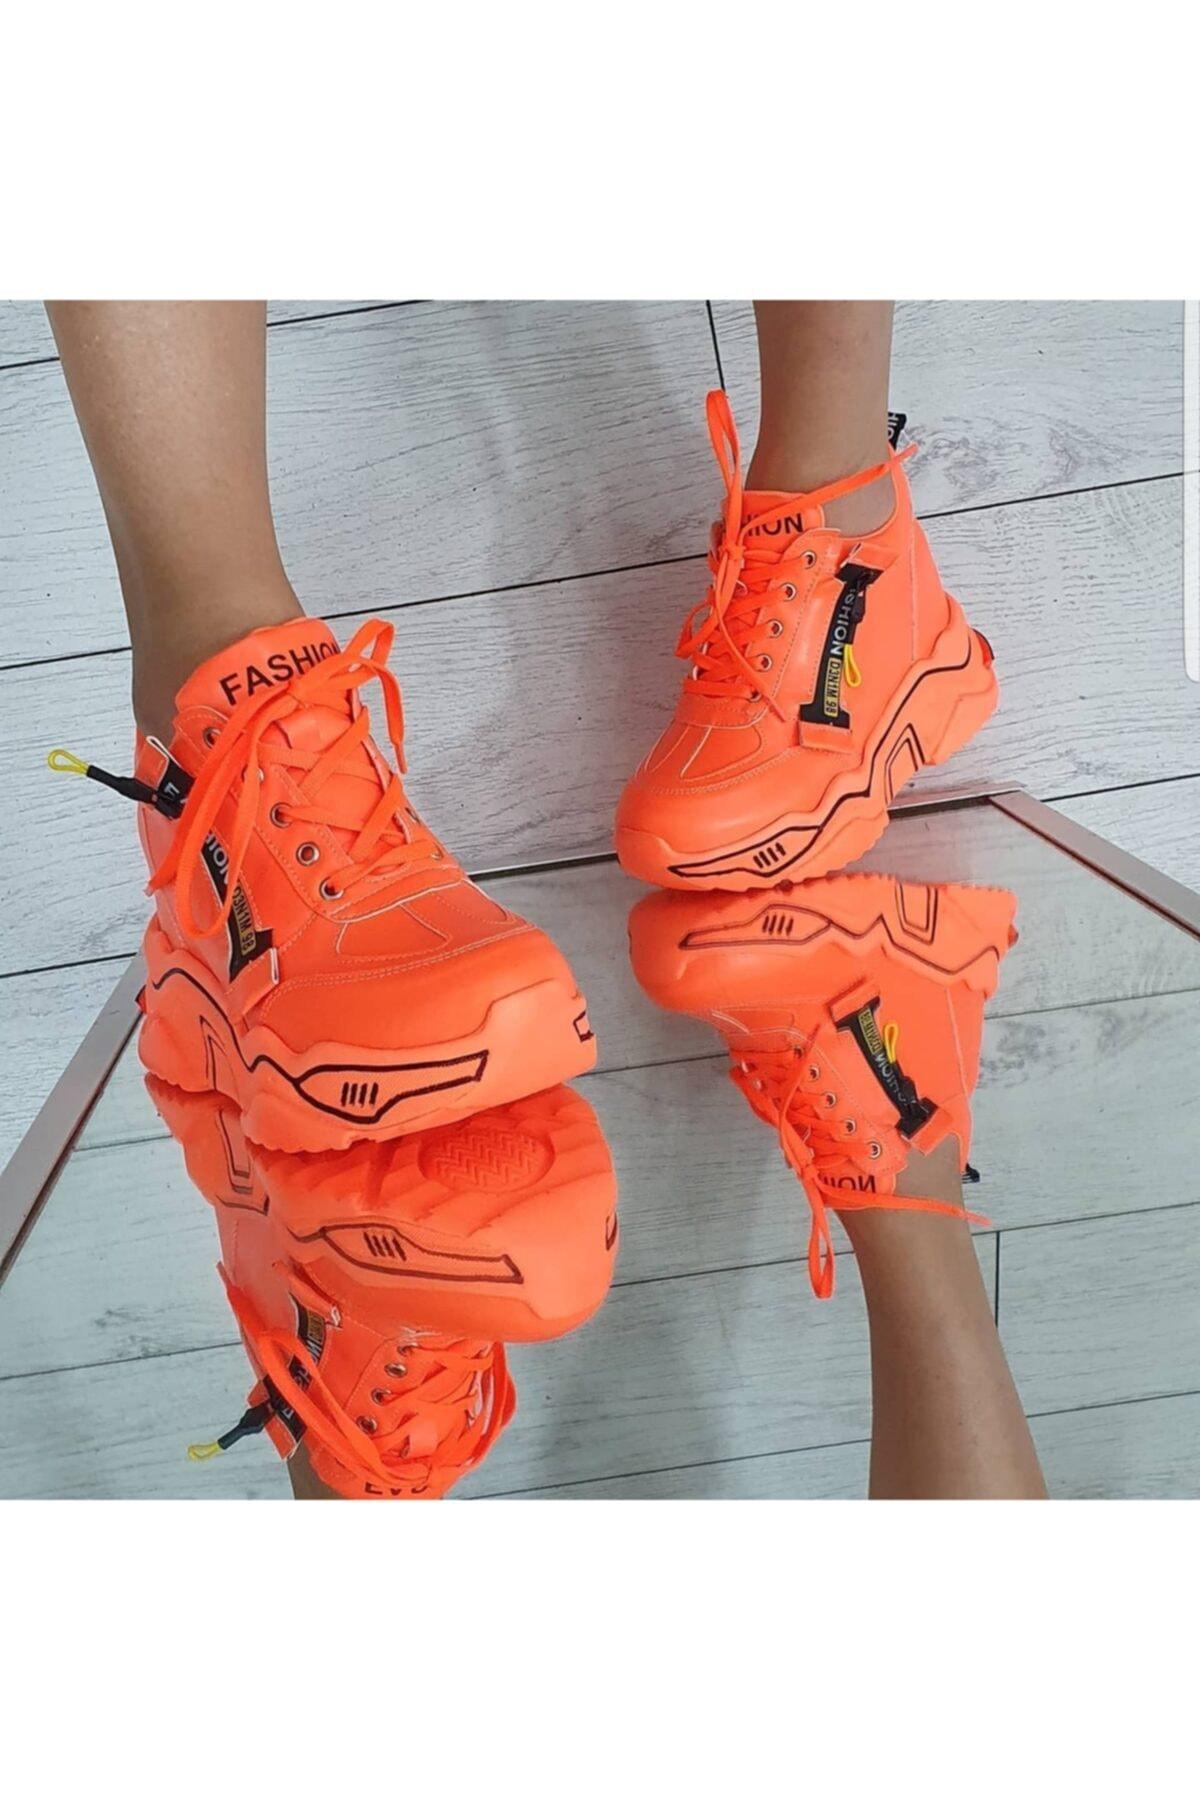 GOTHICA Turuncu Neon Gizli Topuklu Spor Ayakkabı 1